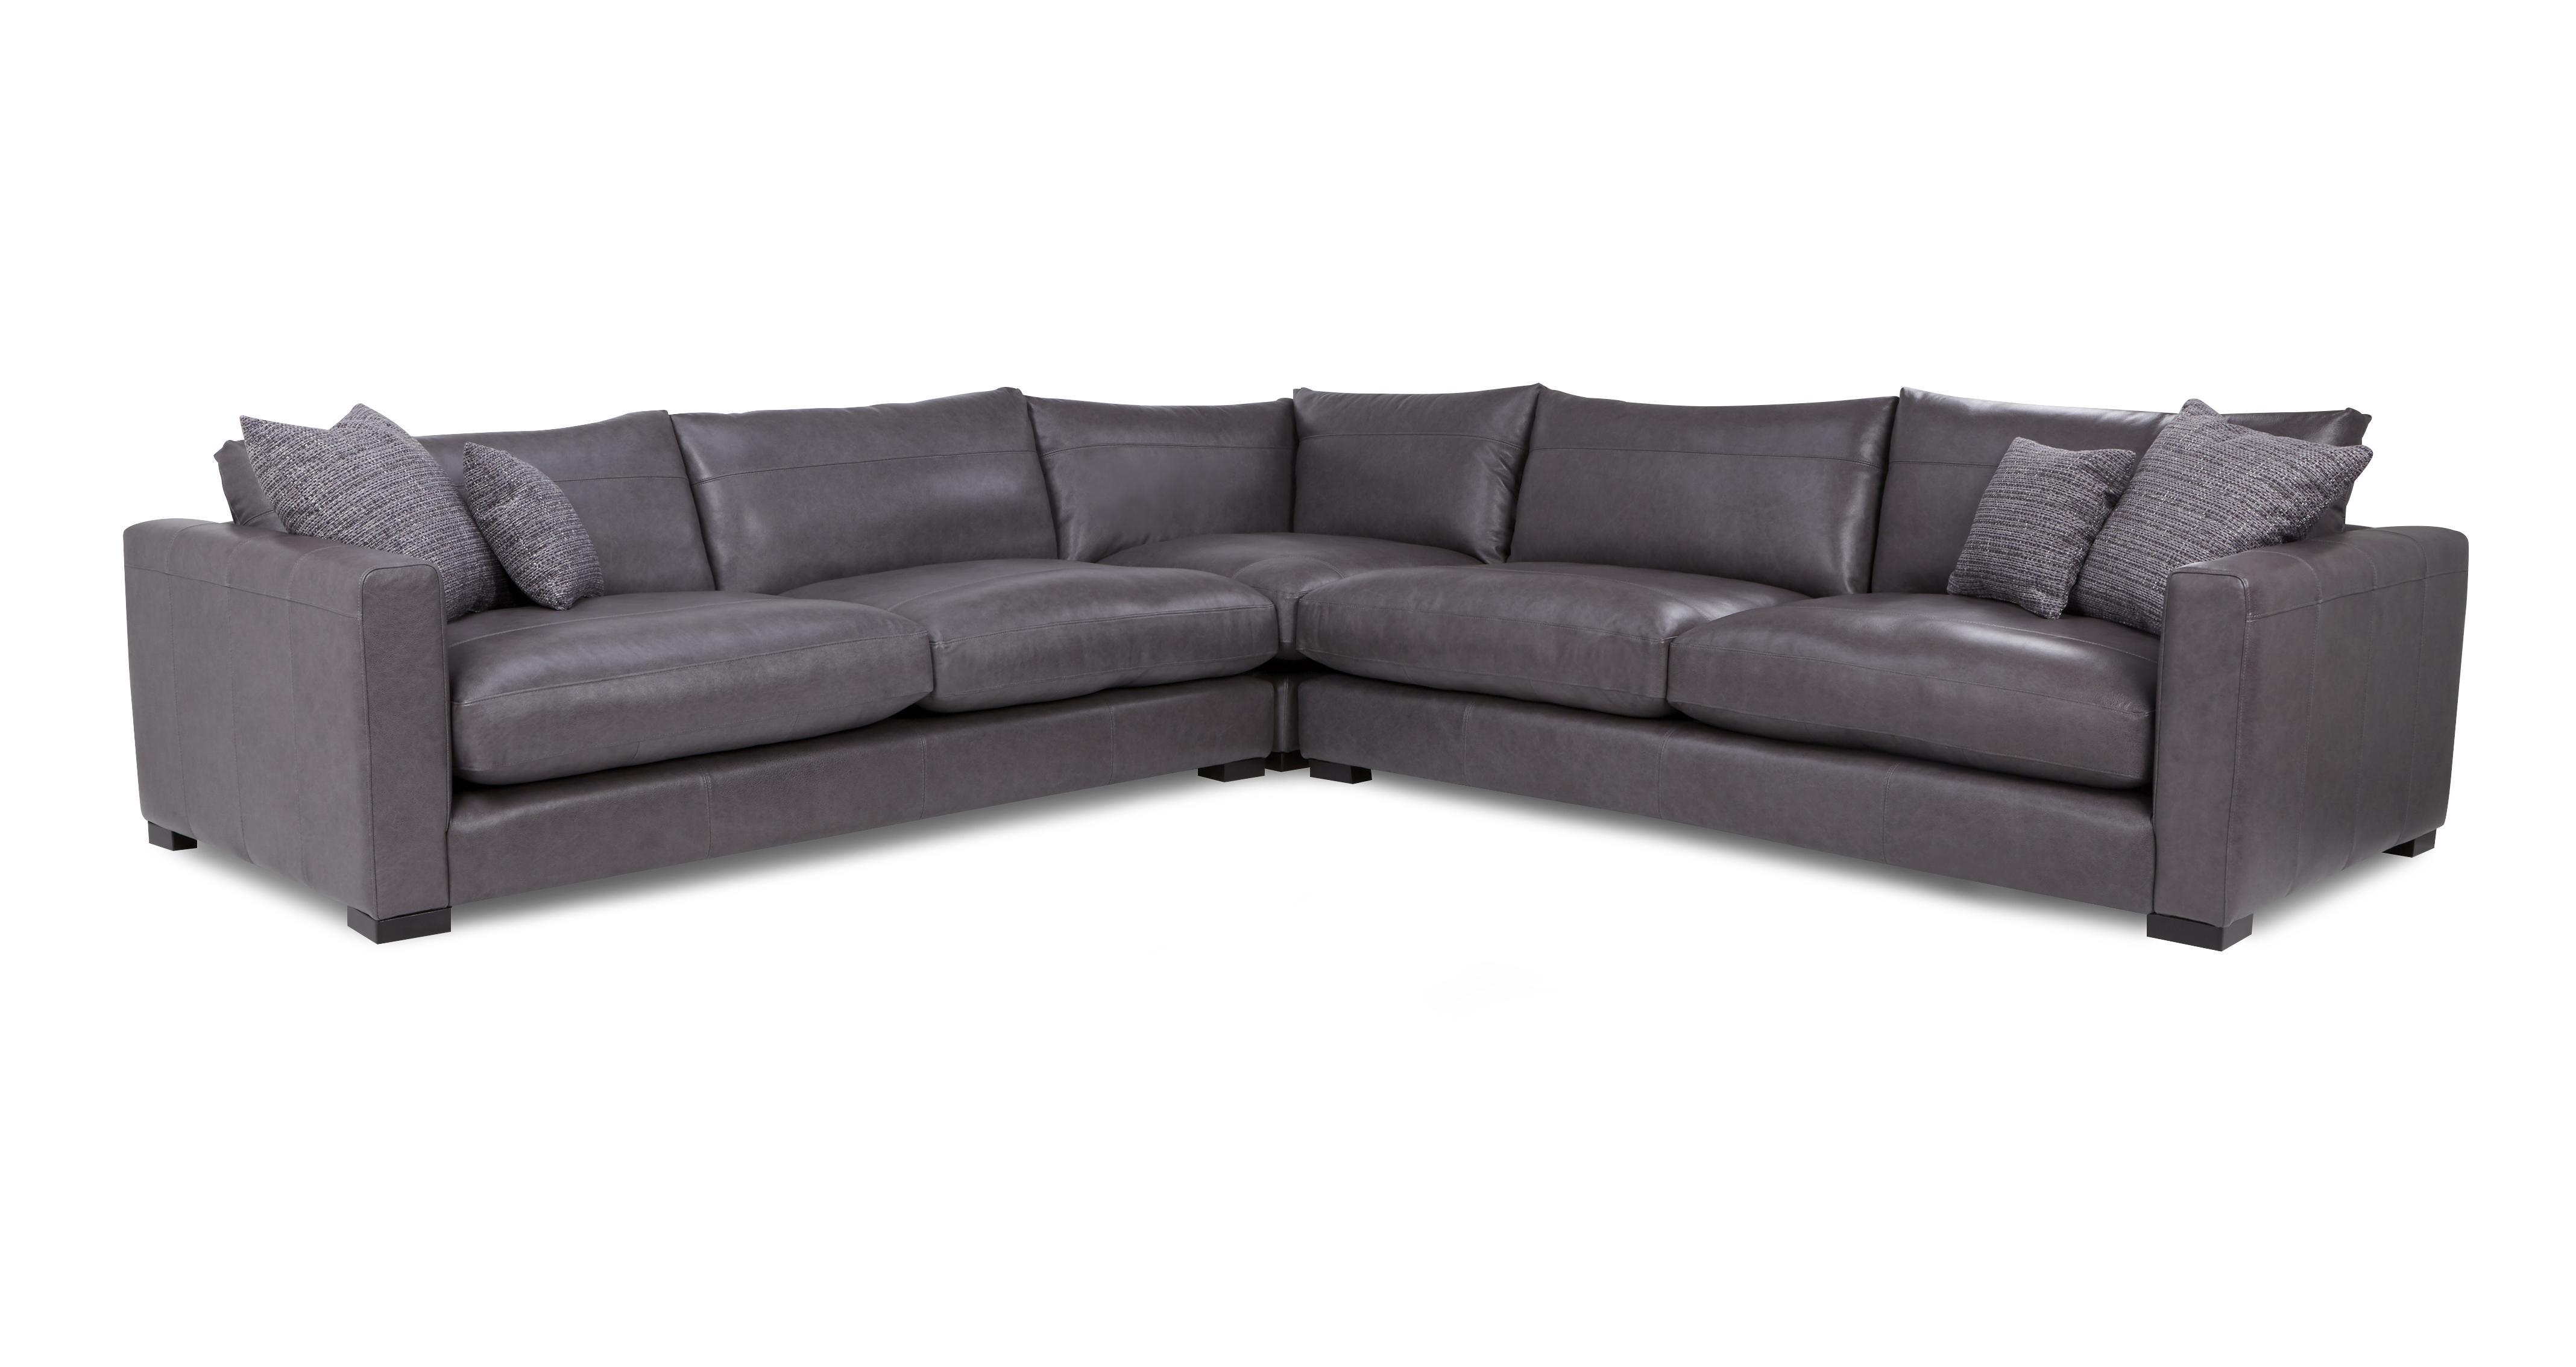 huge leather sectional sofa cheap online bangalore large corner sofas uk brokeasshome